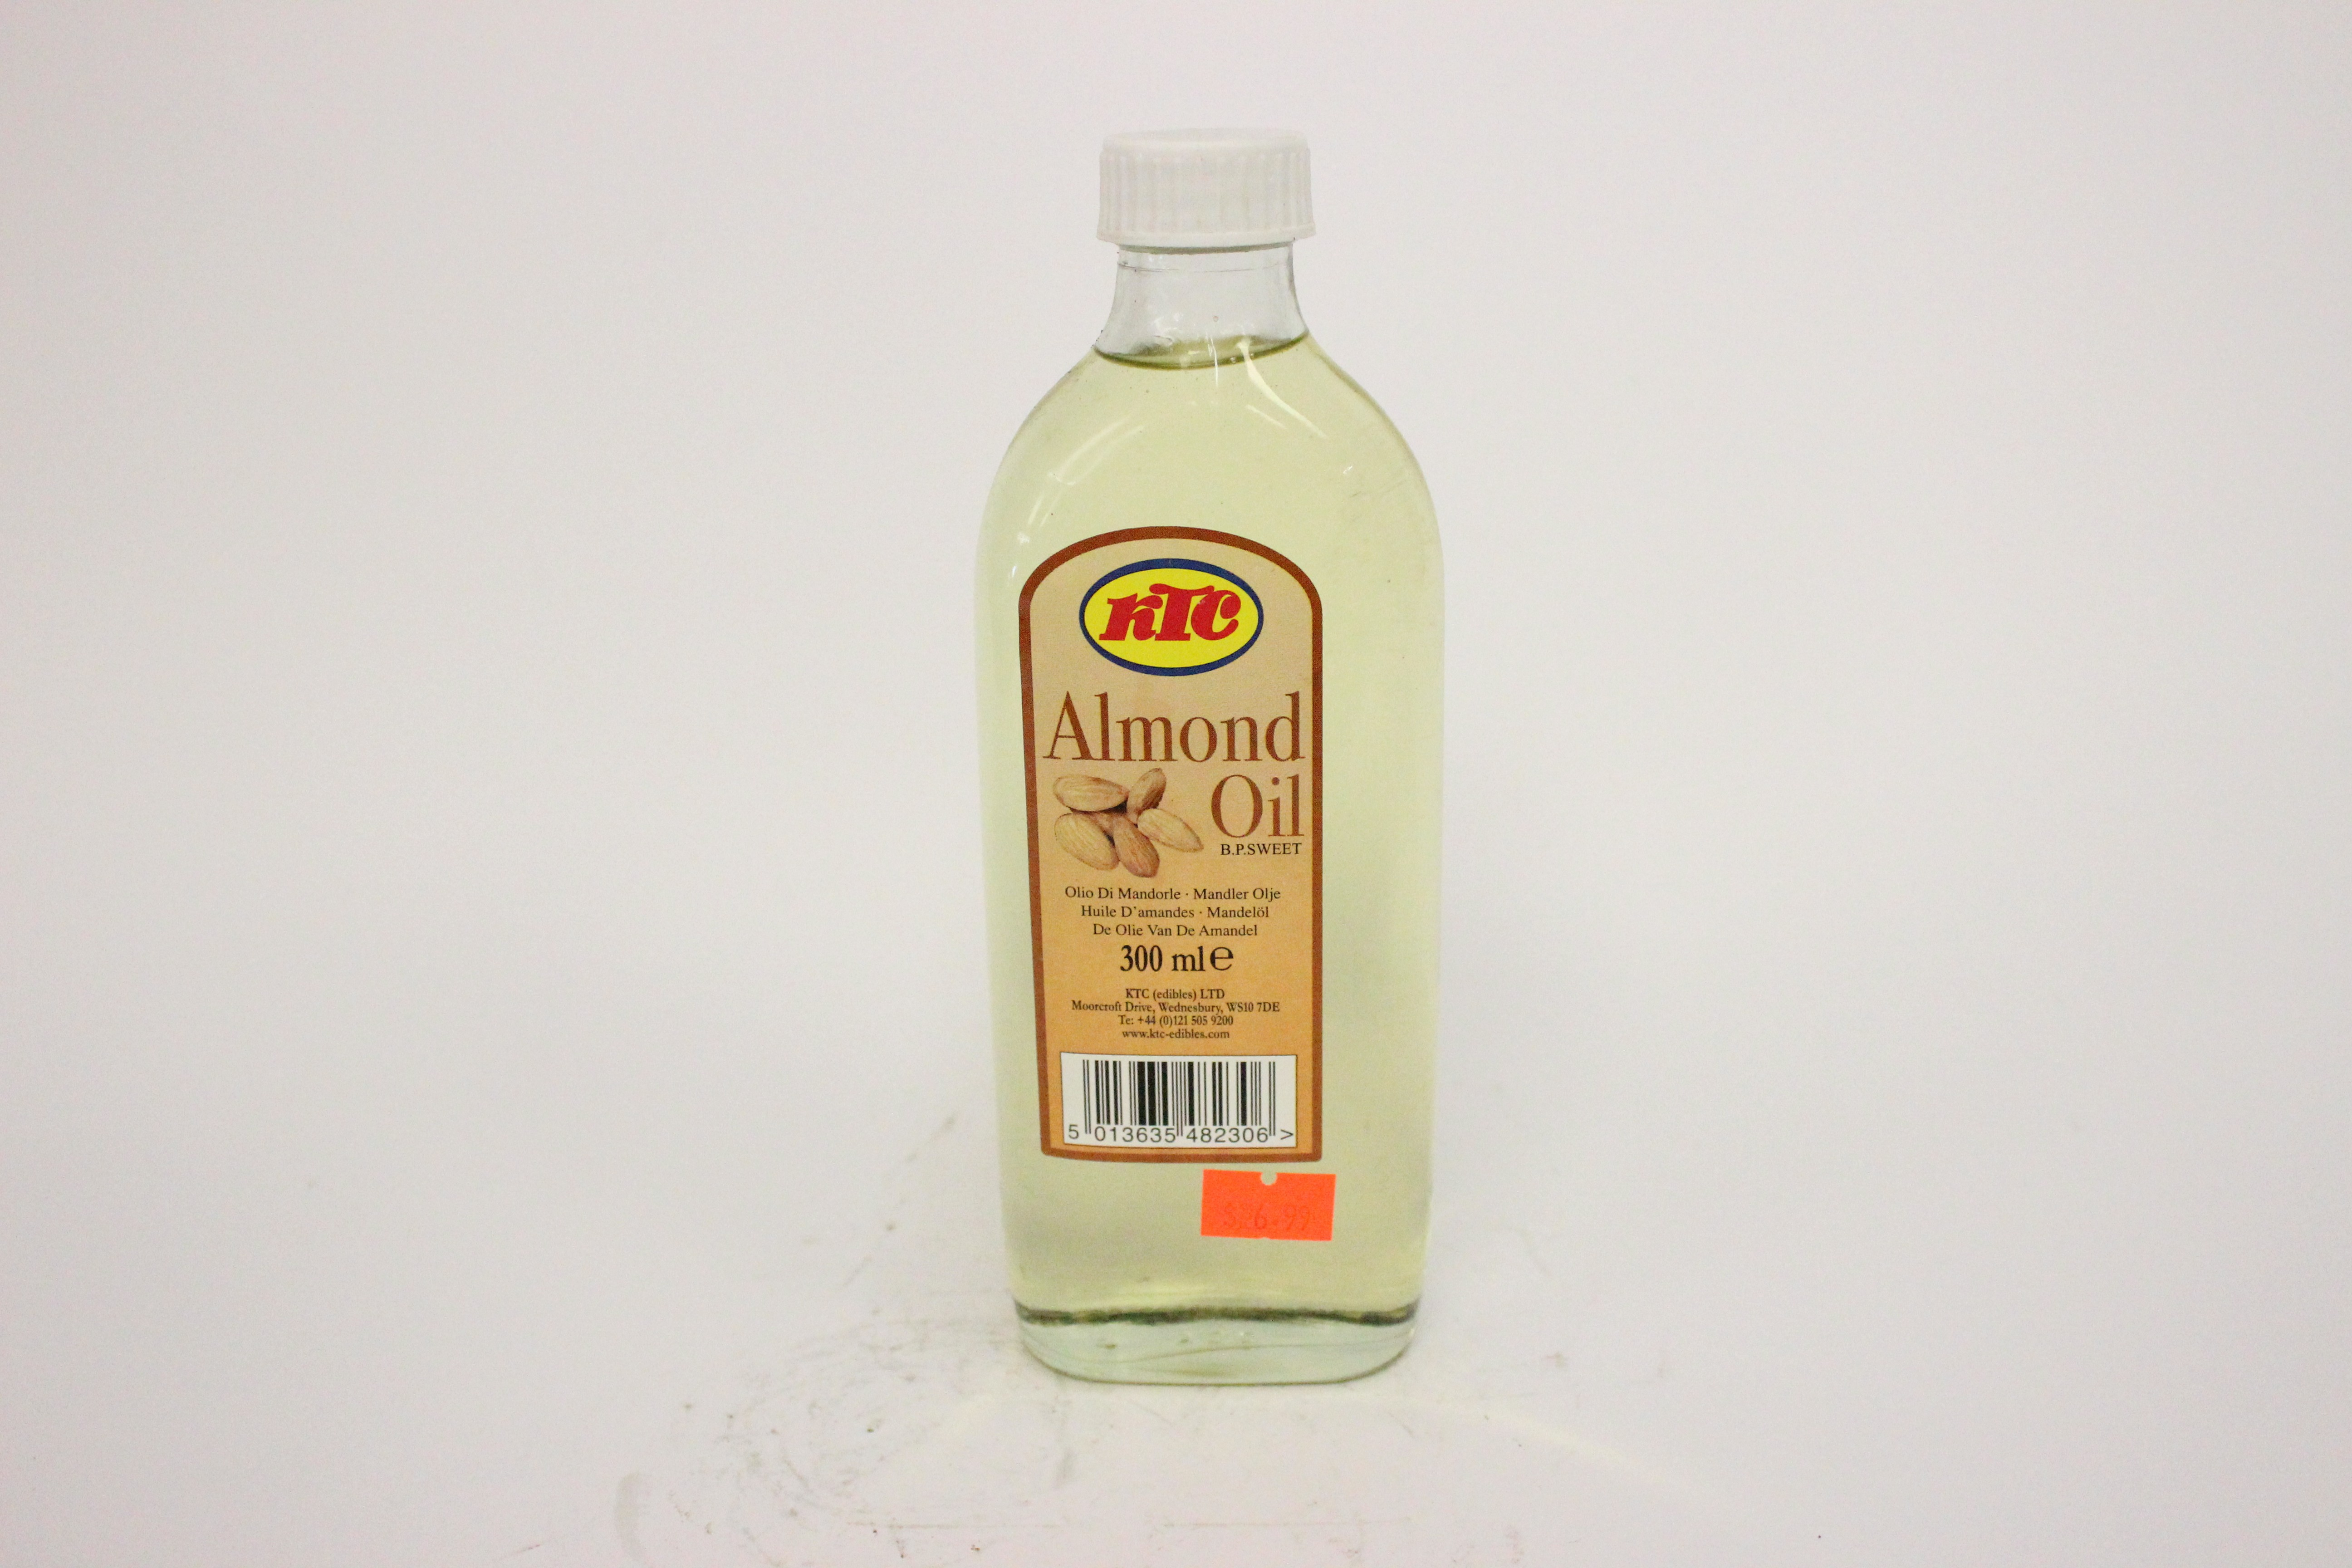 KTC Almond Oil 300 ml